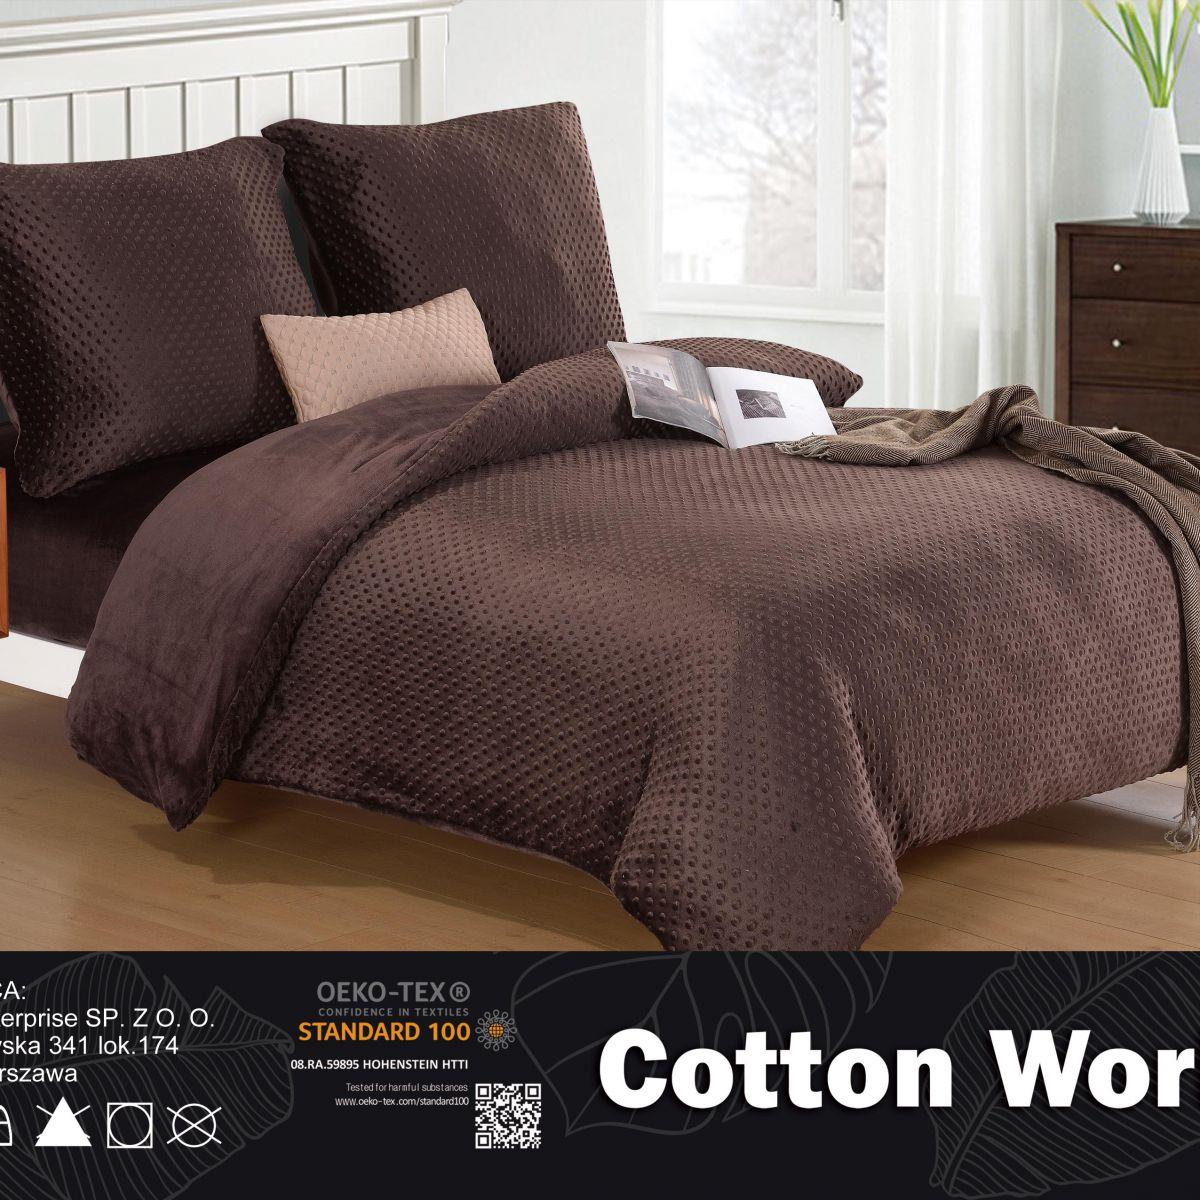 Plush Pressed Beddings - Cotton World - SHE-4701 - 160x200 cm - 3 pcs